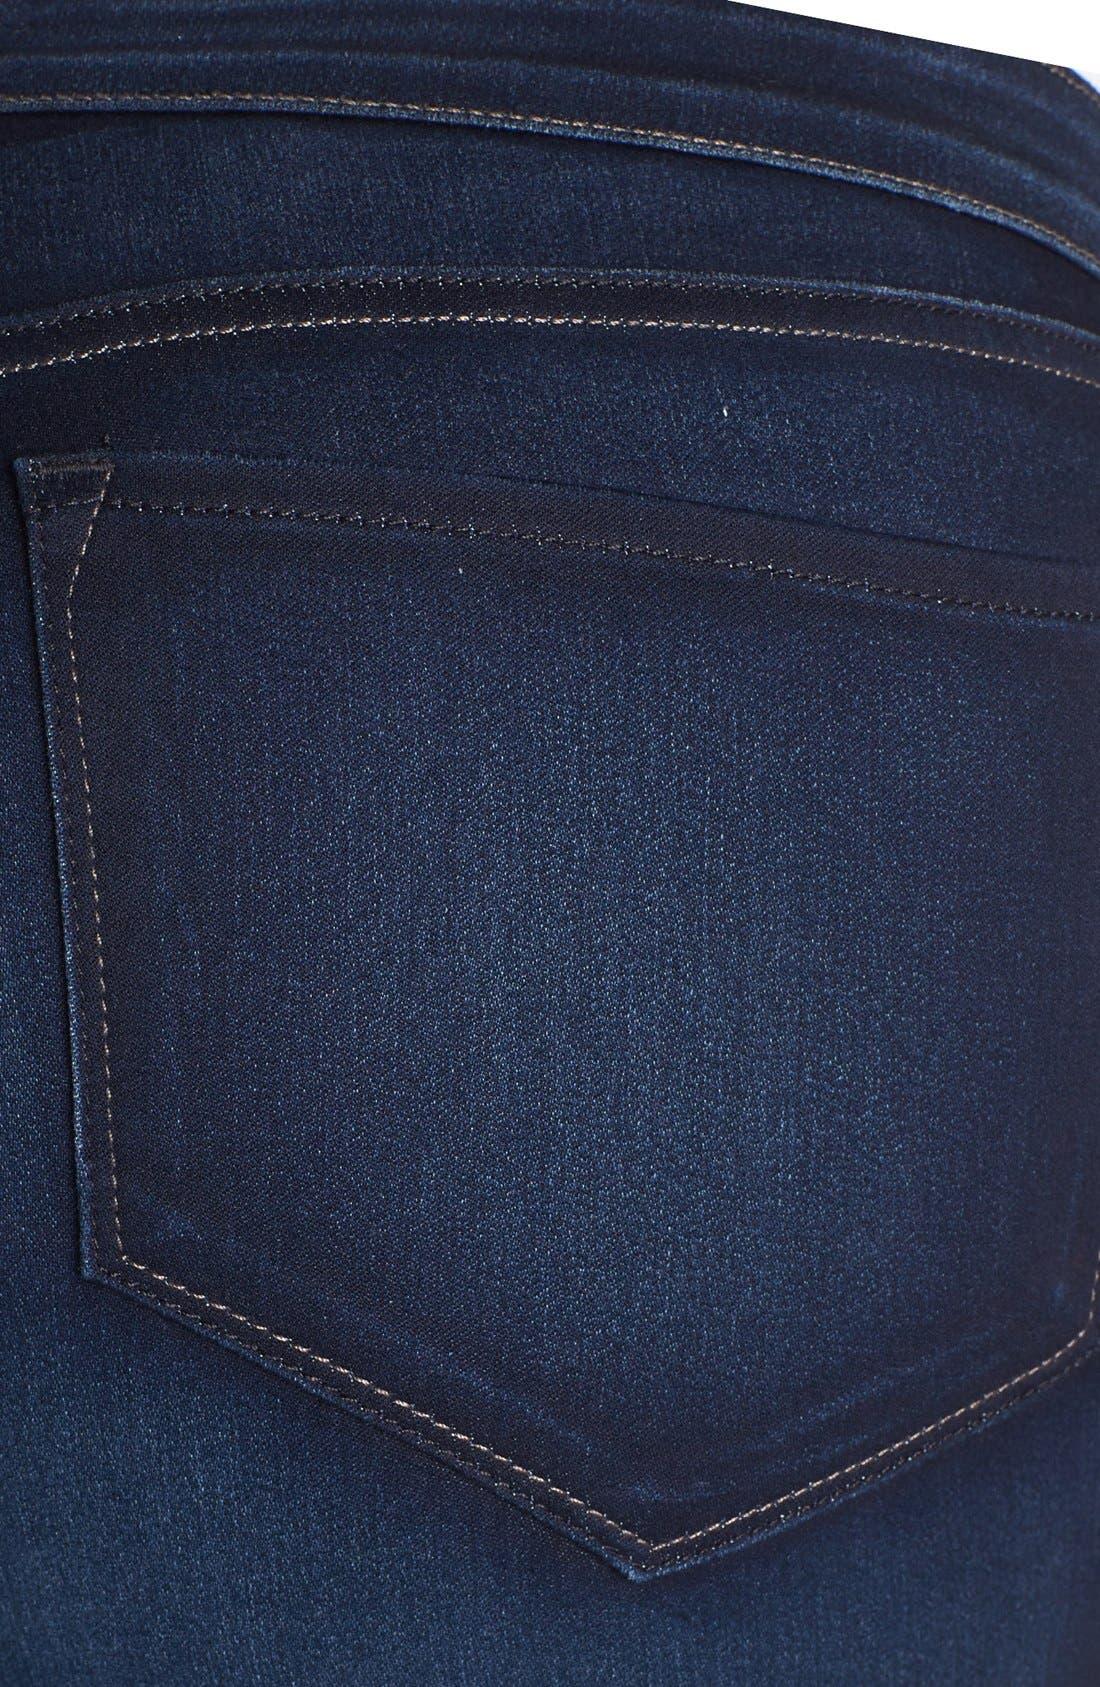 Alternate Image 3  - NYDJ 'Jaclyn' Stretch Skinny Jeans (Pasadena) (Plus Size)